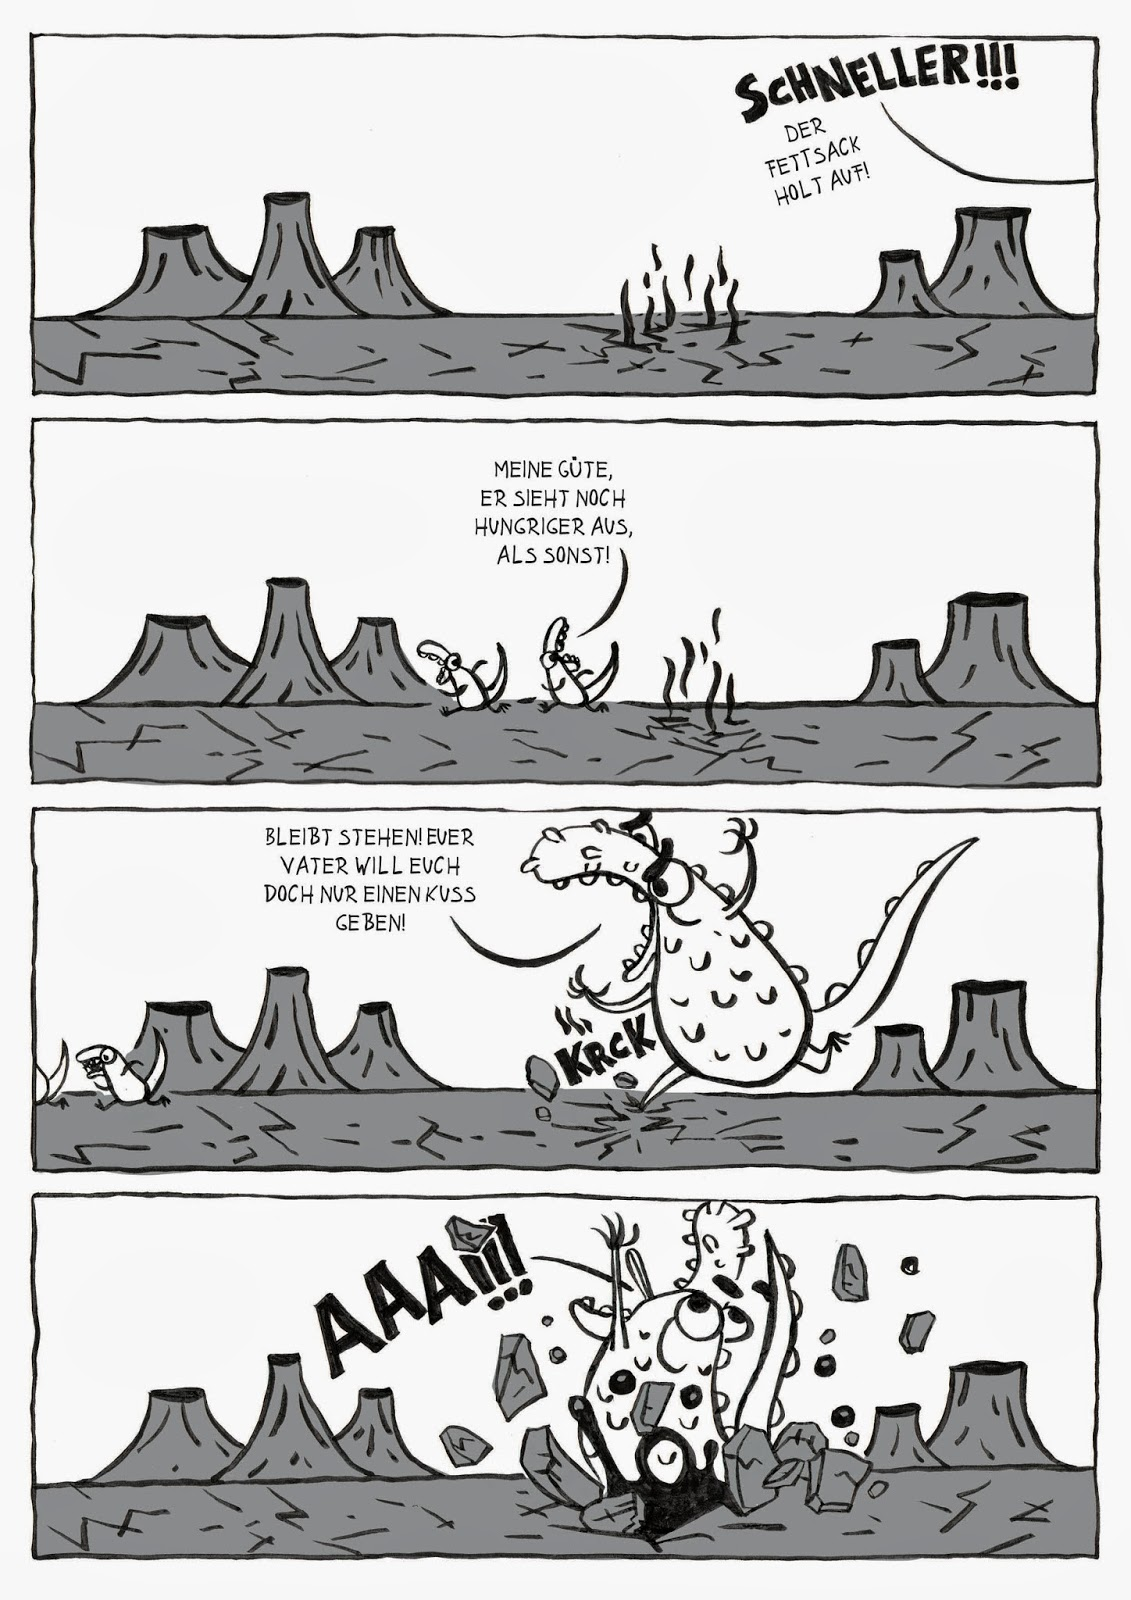 dino, rex, jpeg, comic, humor